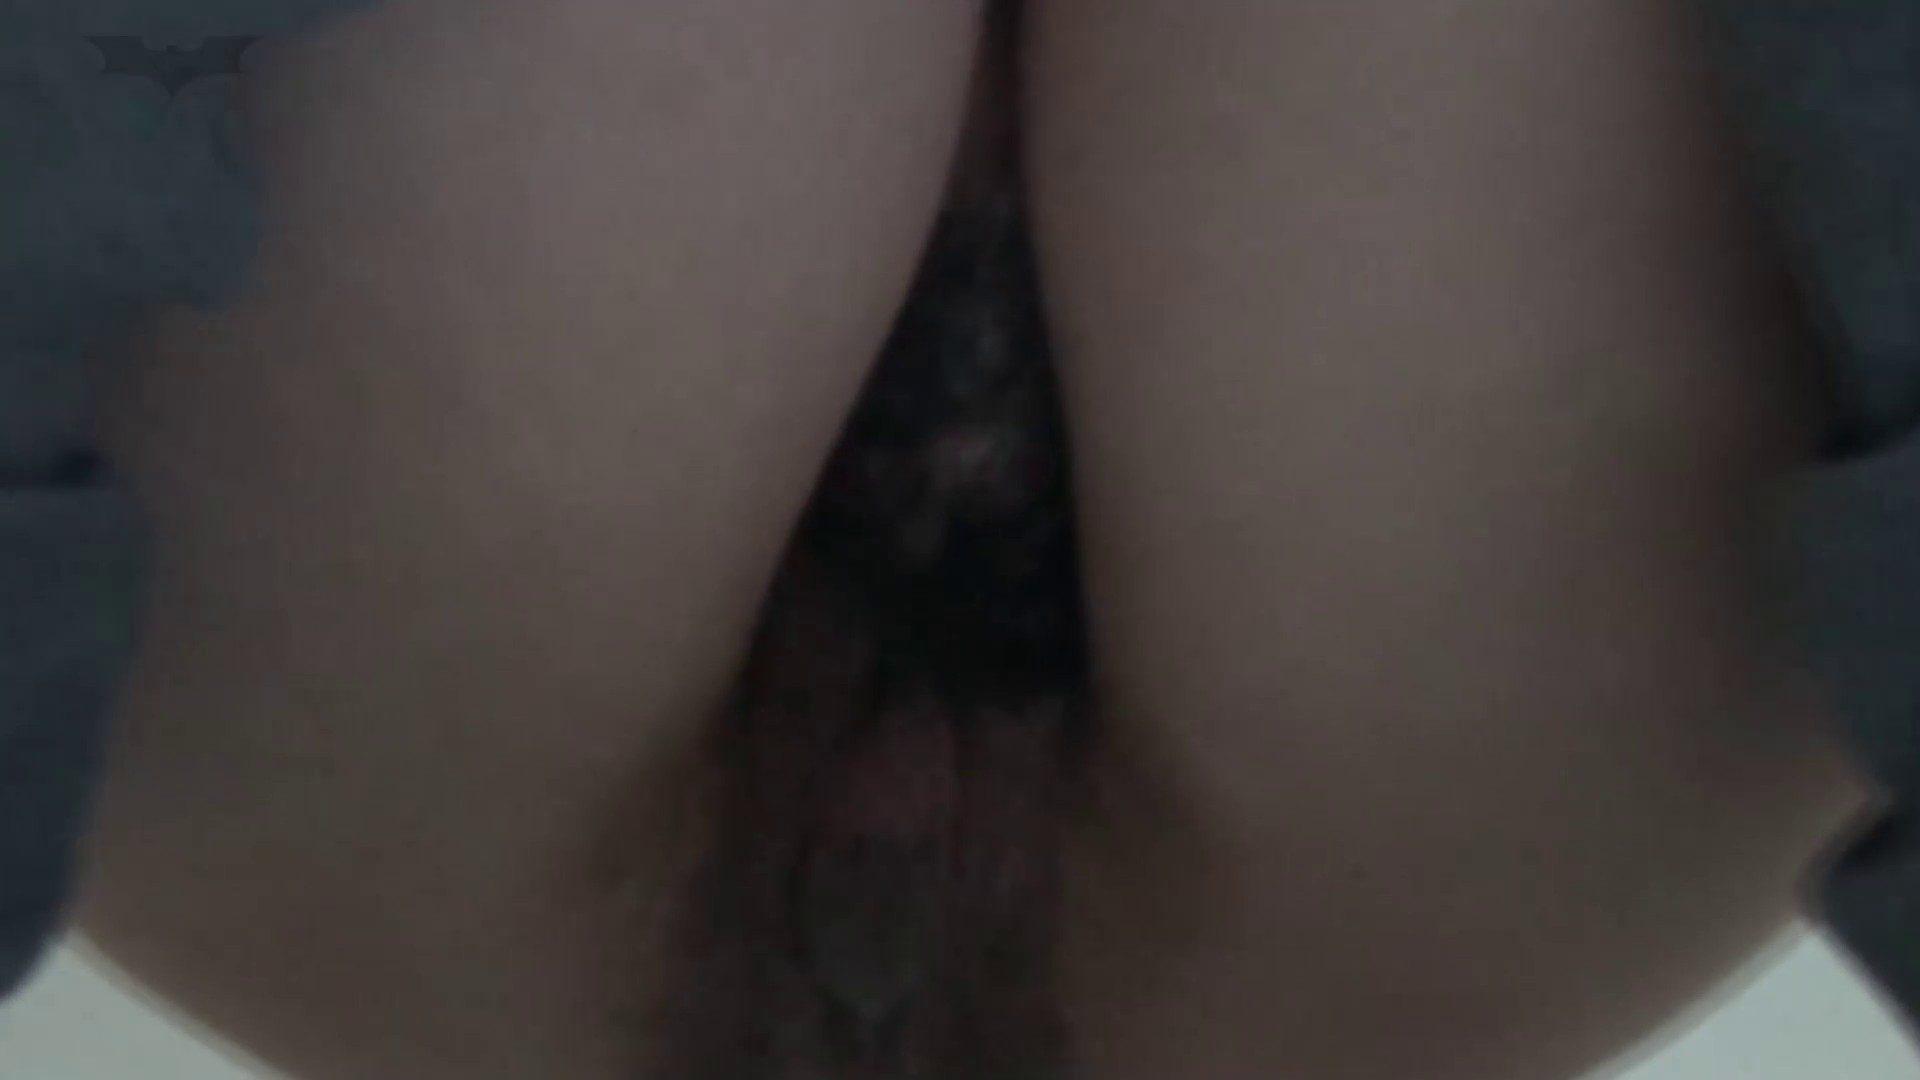 JD盗撮 美女の洗面所の秘密 Vol.21 トイレで・・・ AV無料動画キャプチャ 63画像 59